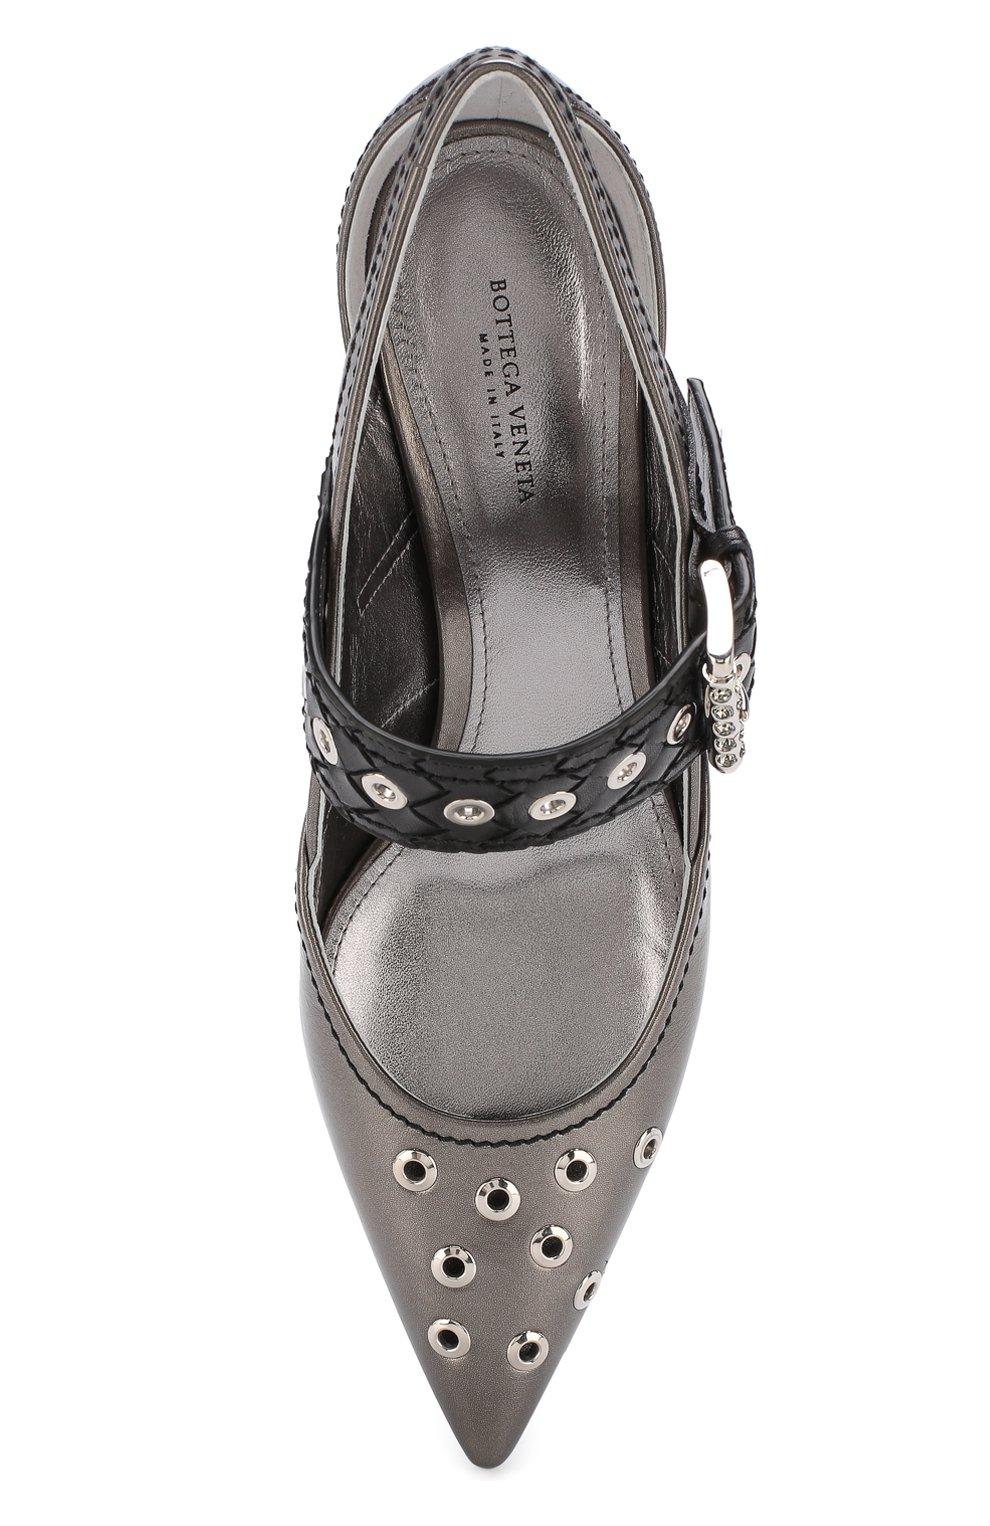 Женские туфли из металлизированной кожи на каблуке kitten heel BOTTEGA VENETA серебряного цвета, арт. 512136/VAVG6 | Фото 5